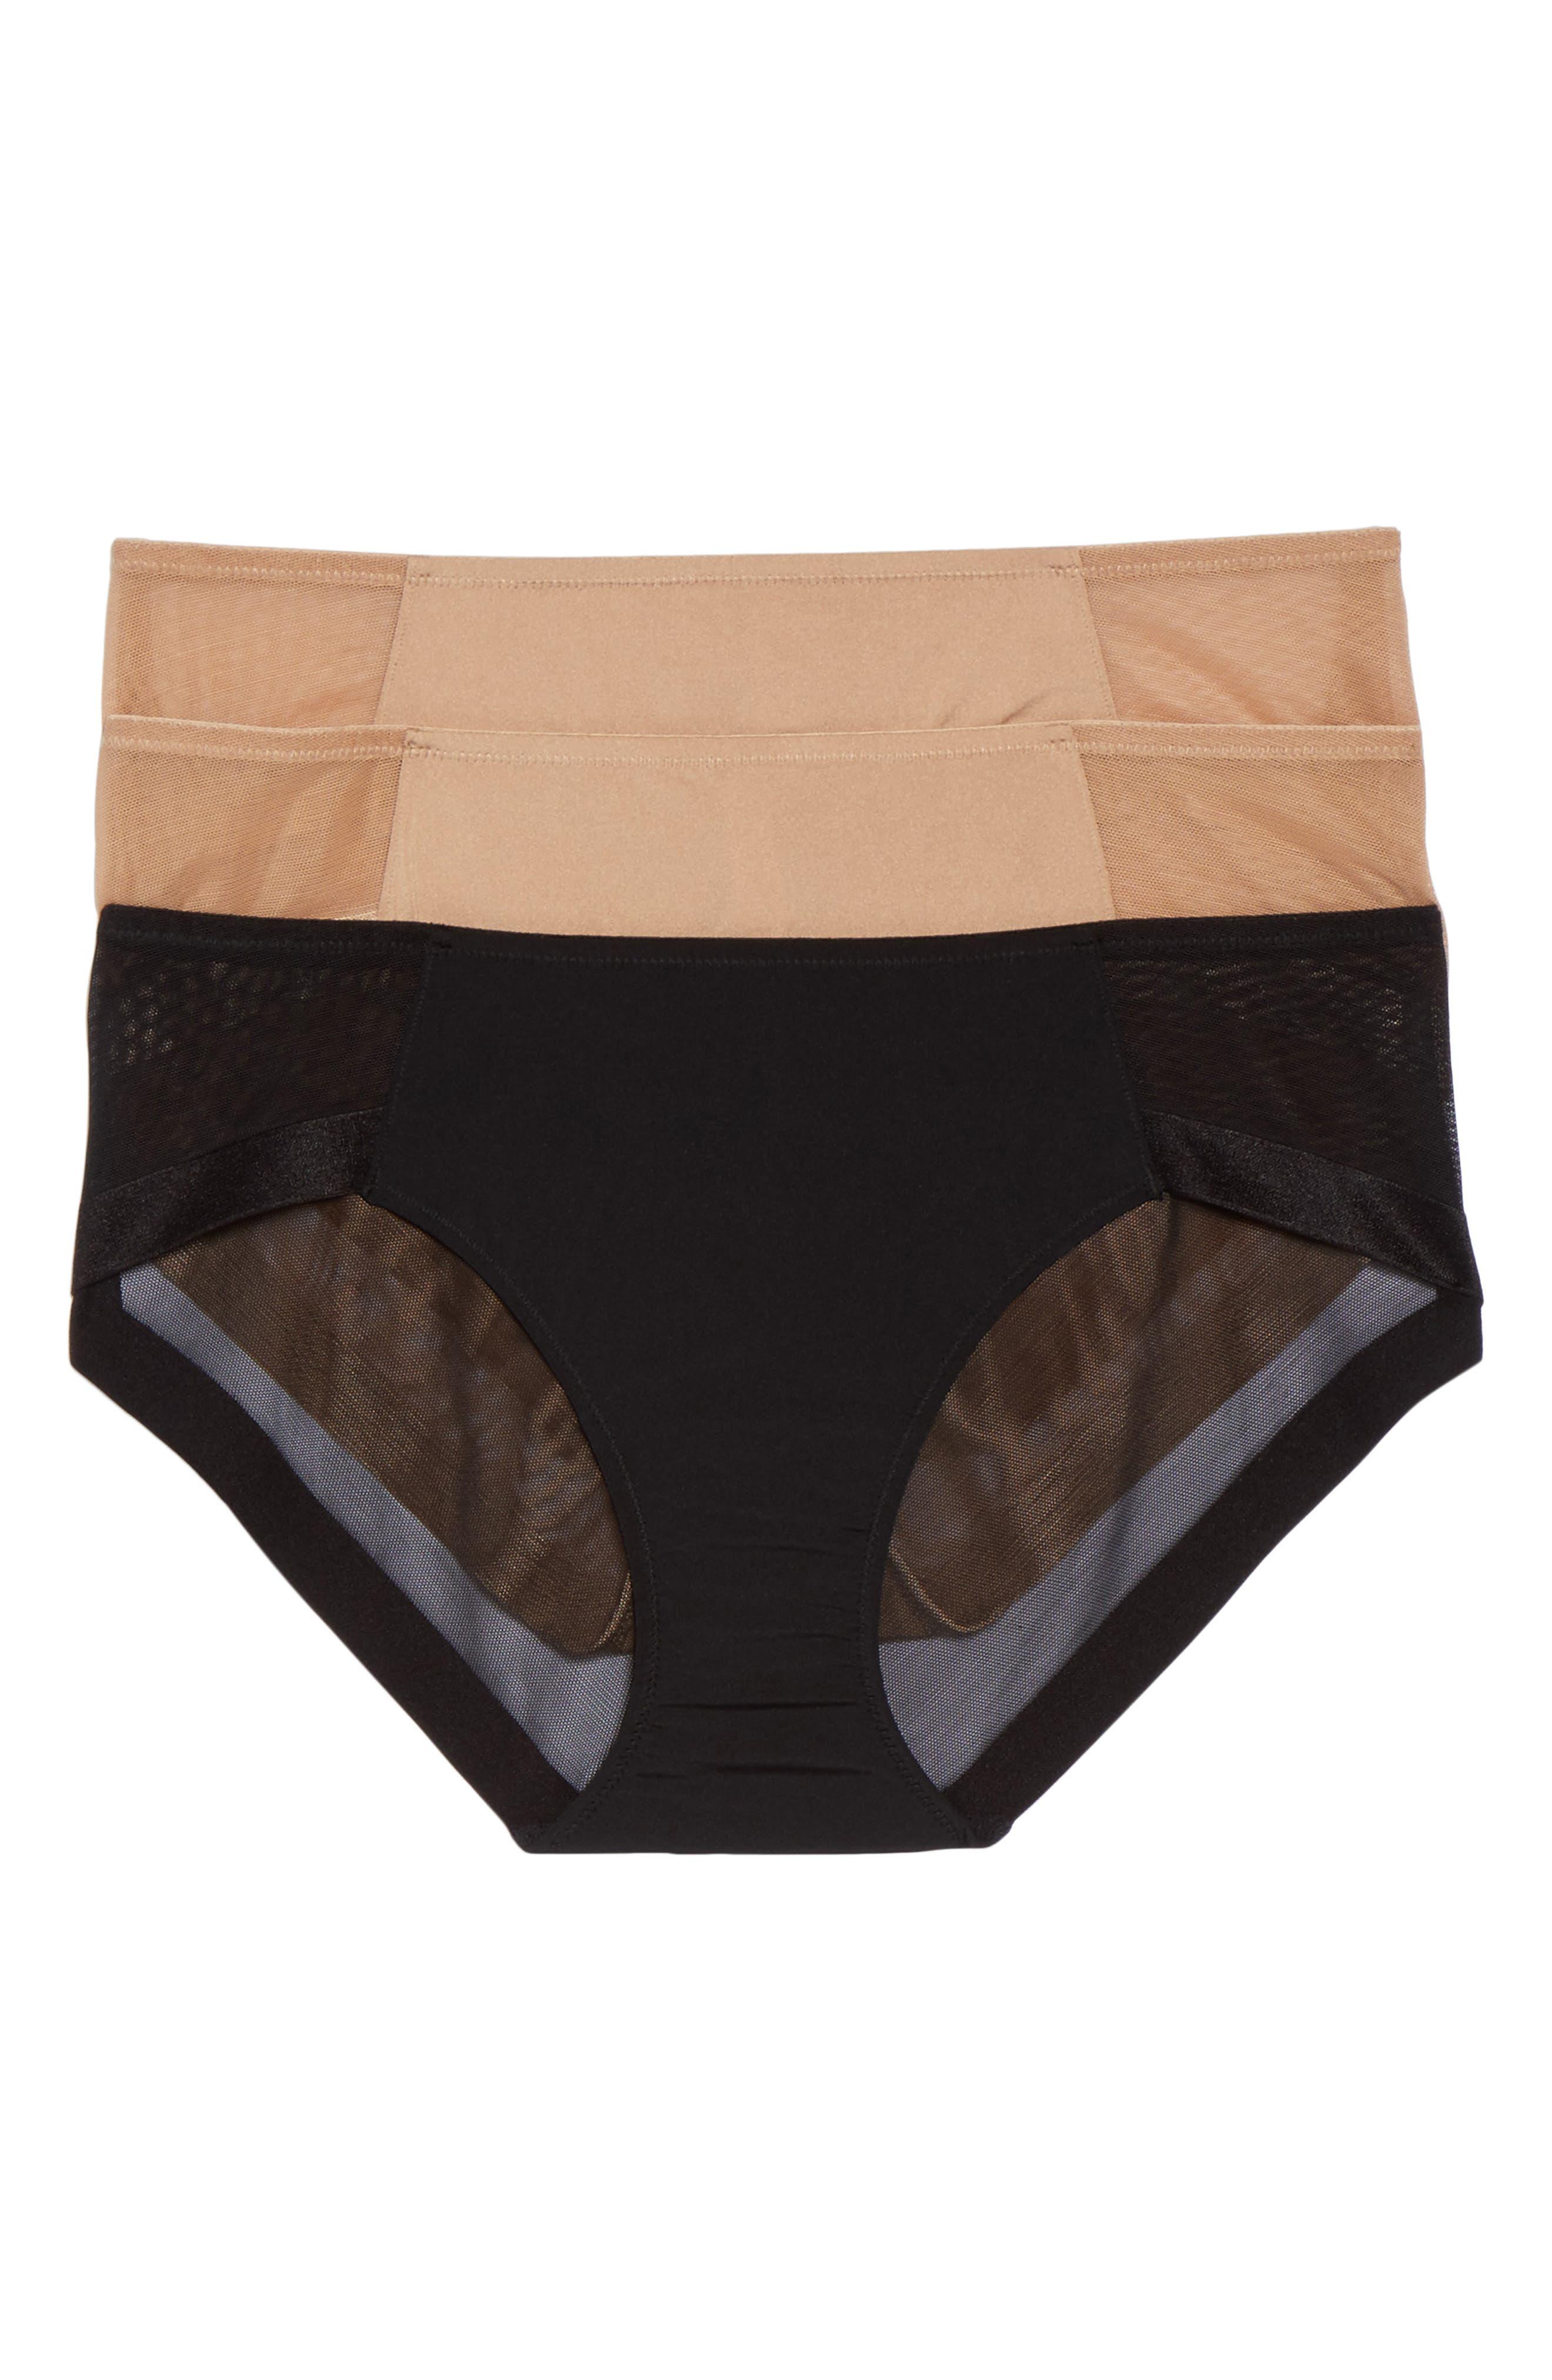 Main Image - Le Mystère Infinite Edge 3-Pack Bikini